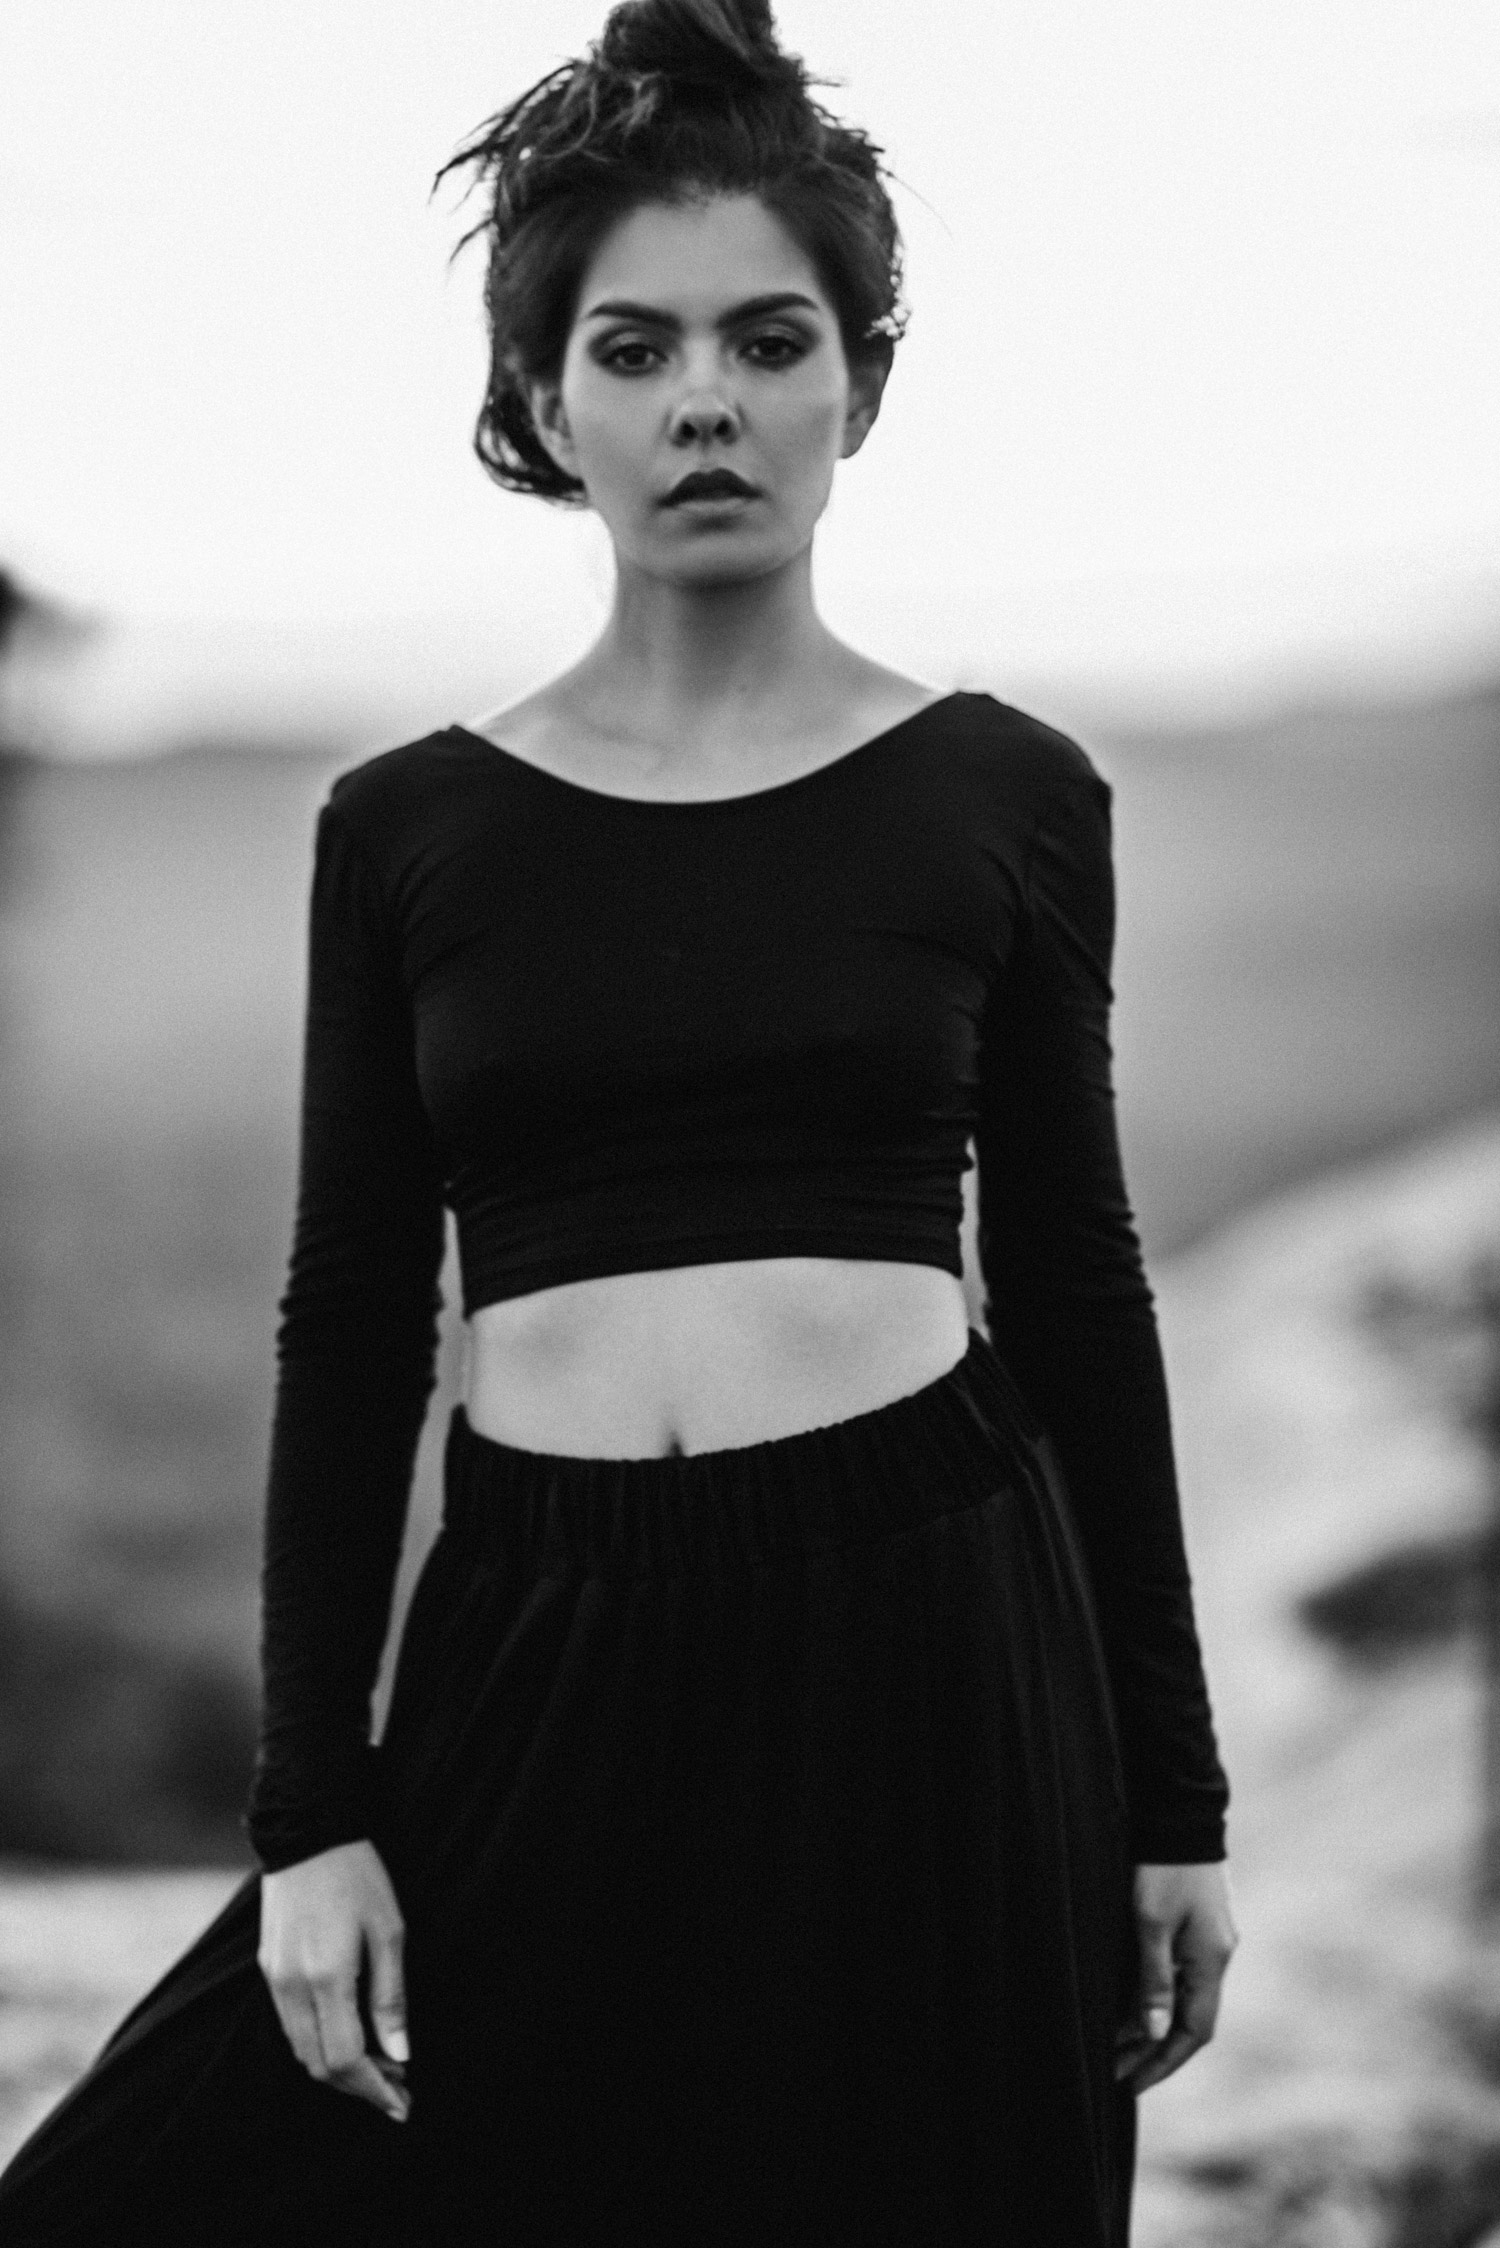 san-francisco-fashion-photographer-3609.jpg